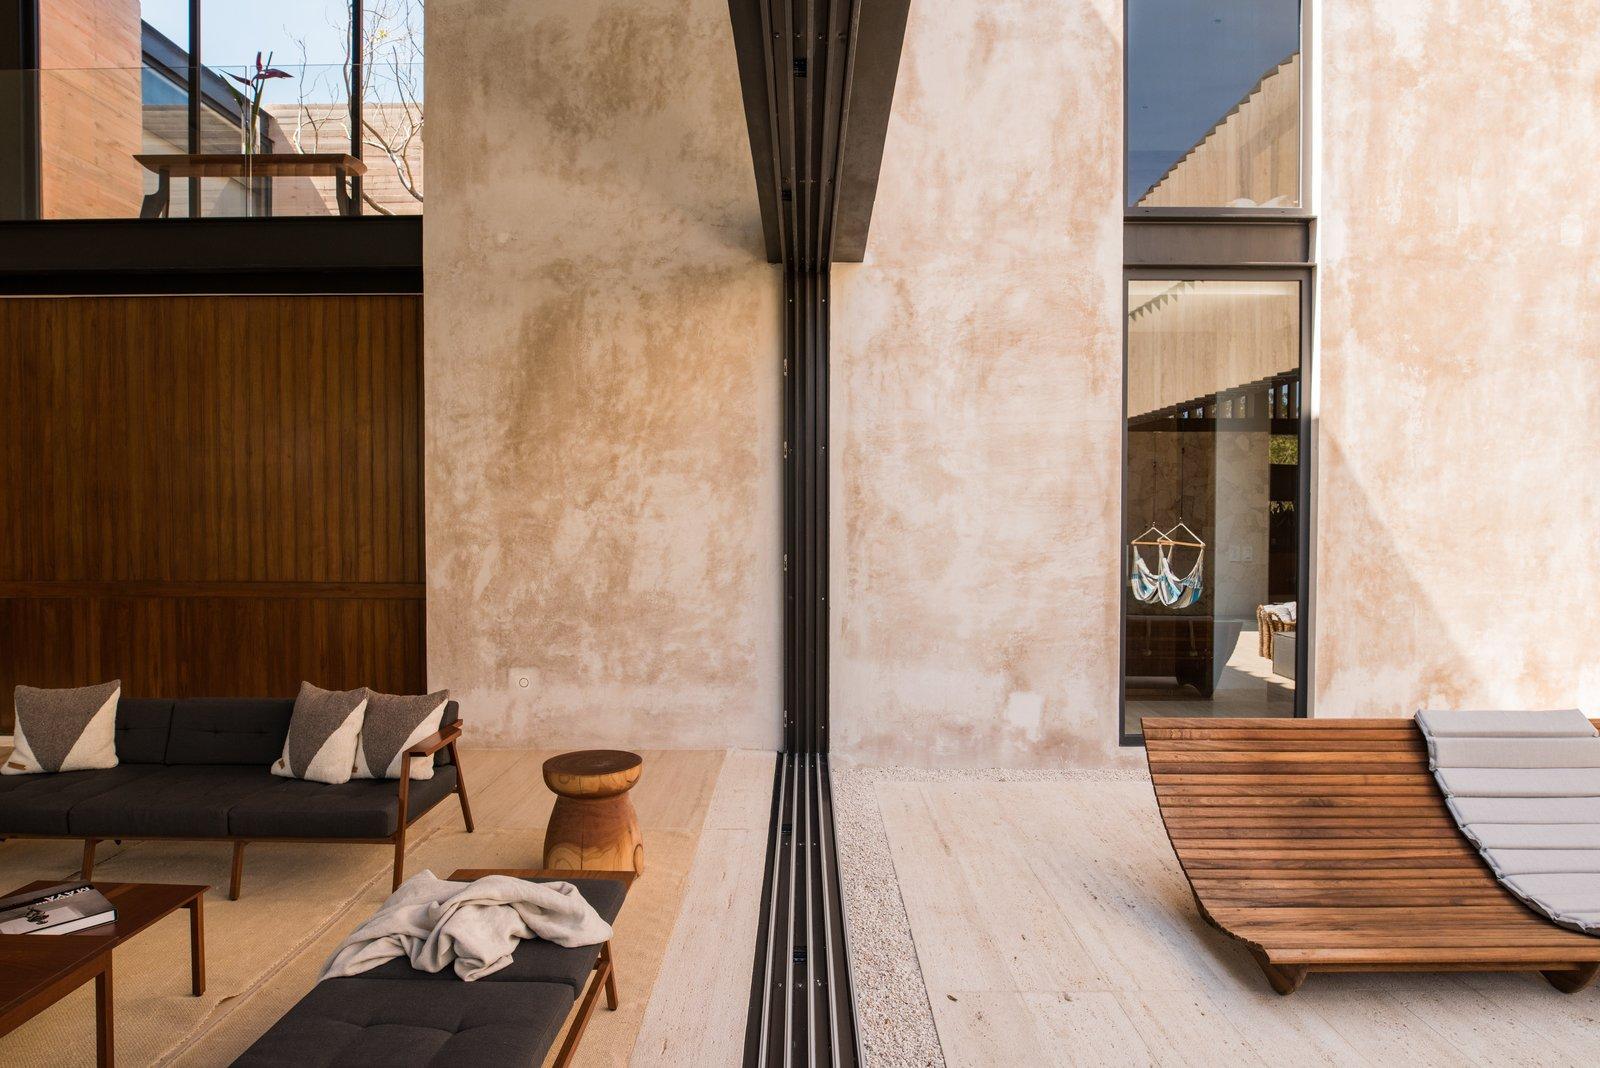 Interior / Exterior Casa Chaaltun by tescala